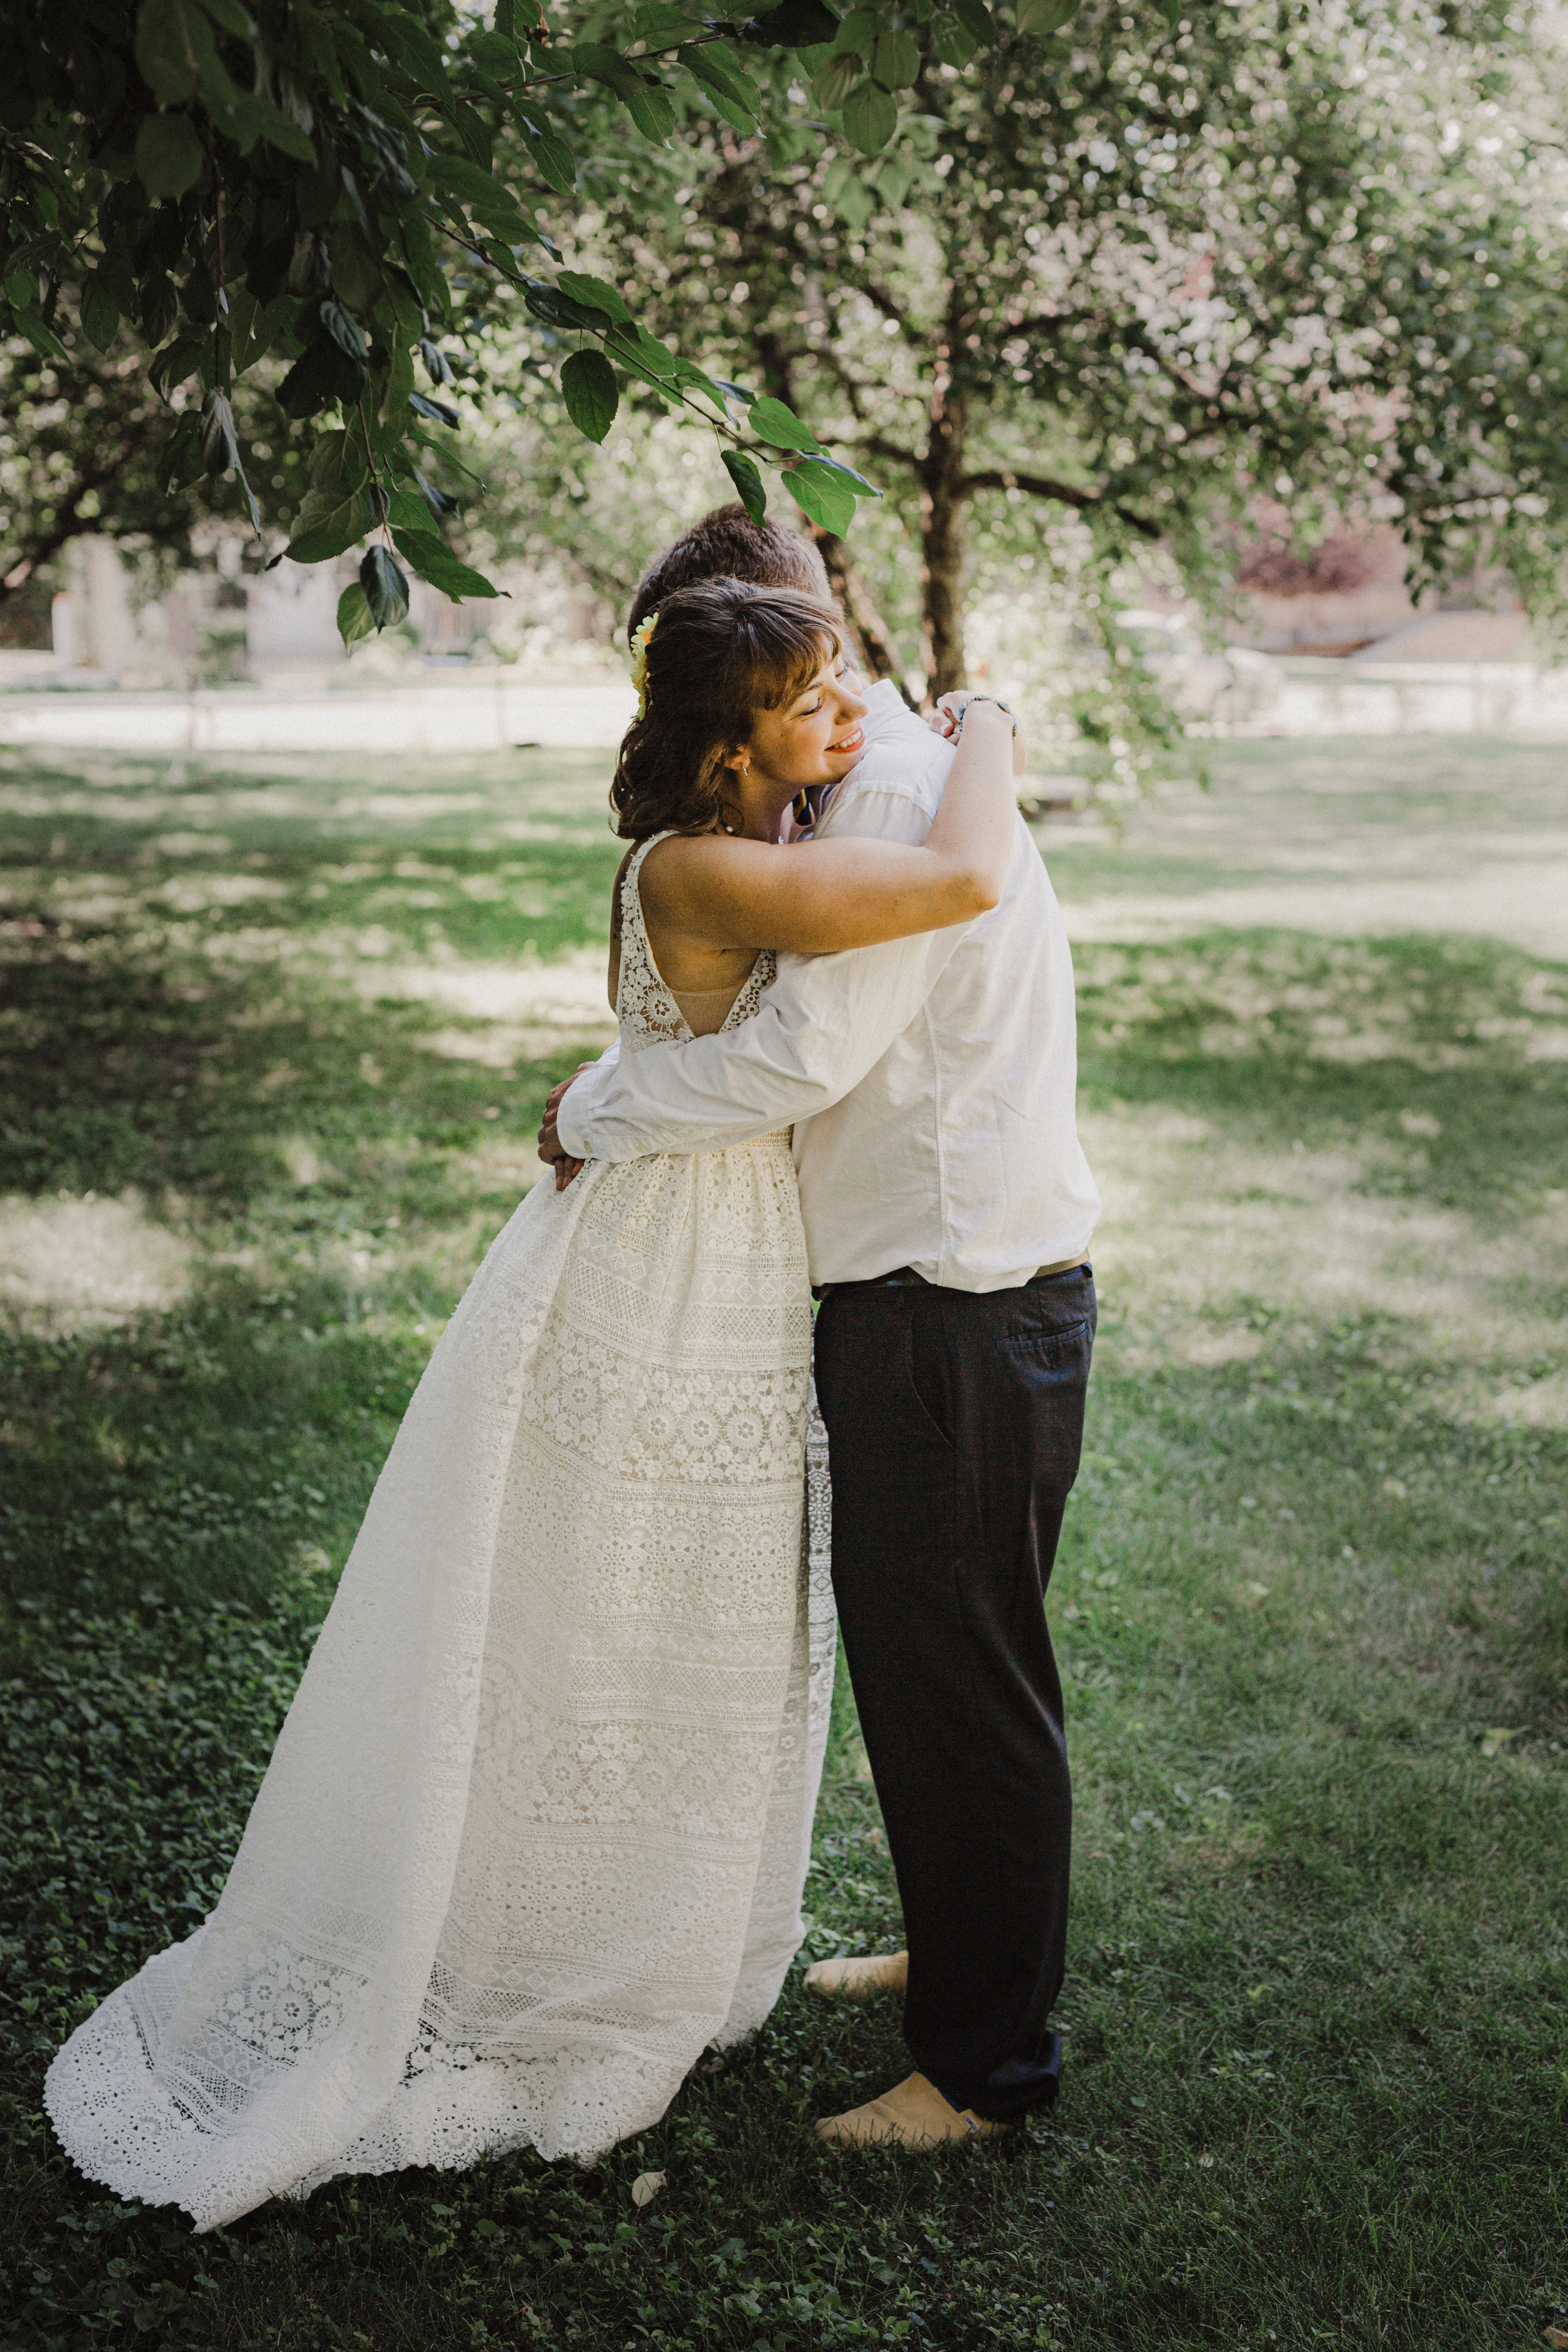 WeddingSM-17.jpg